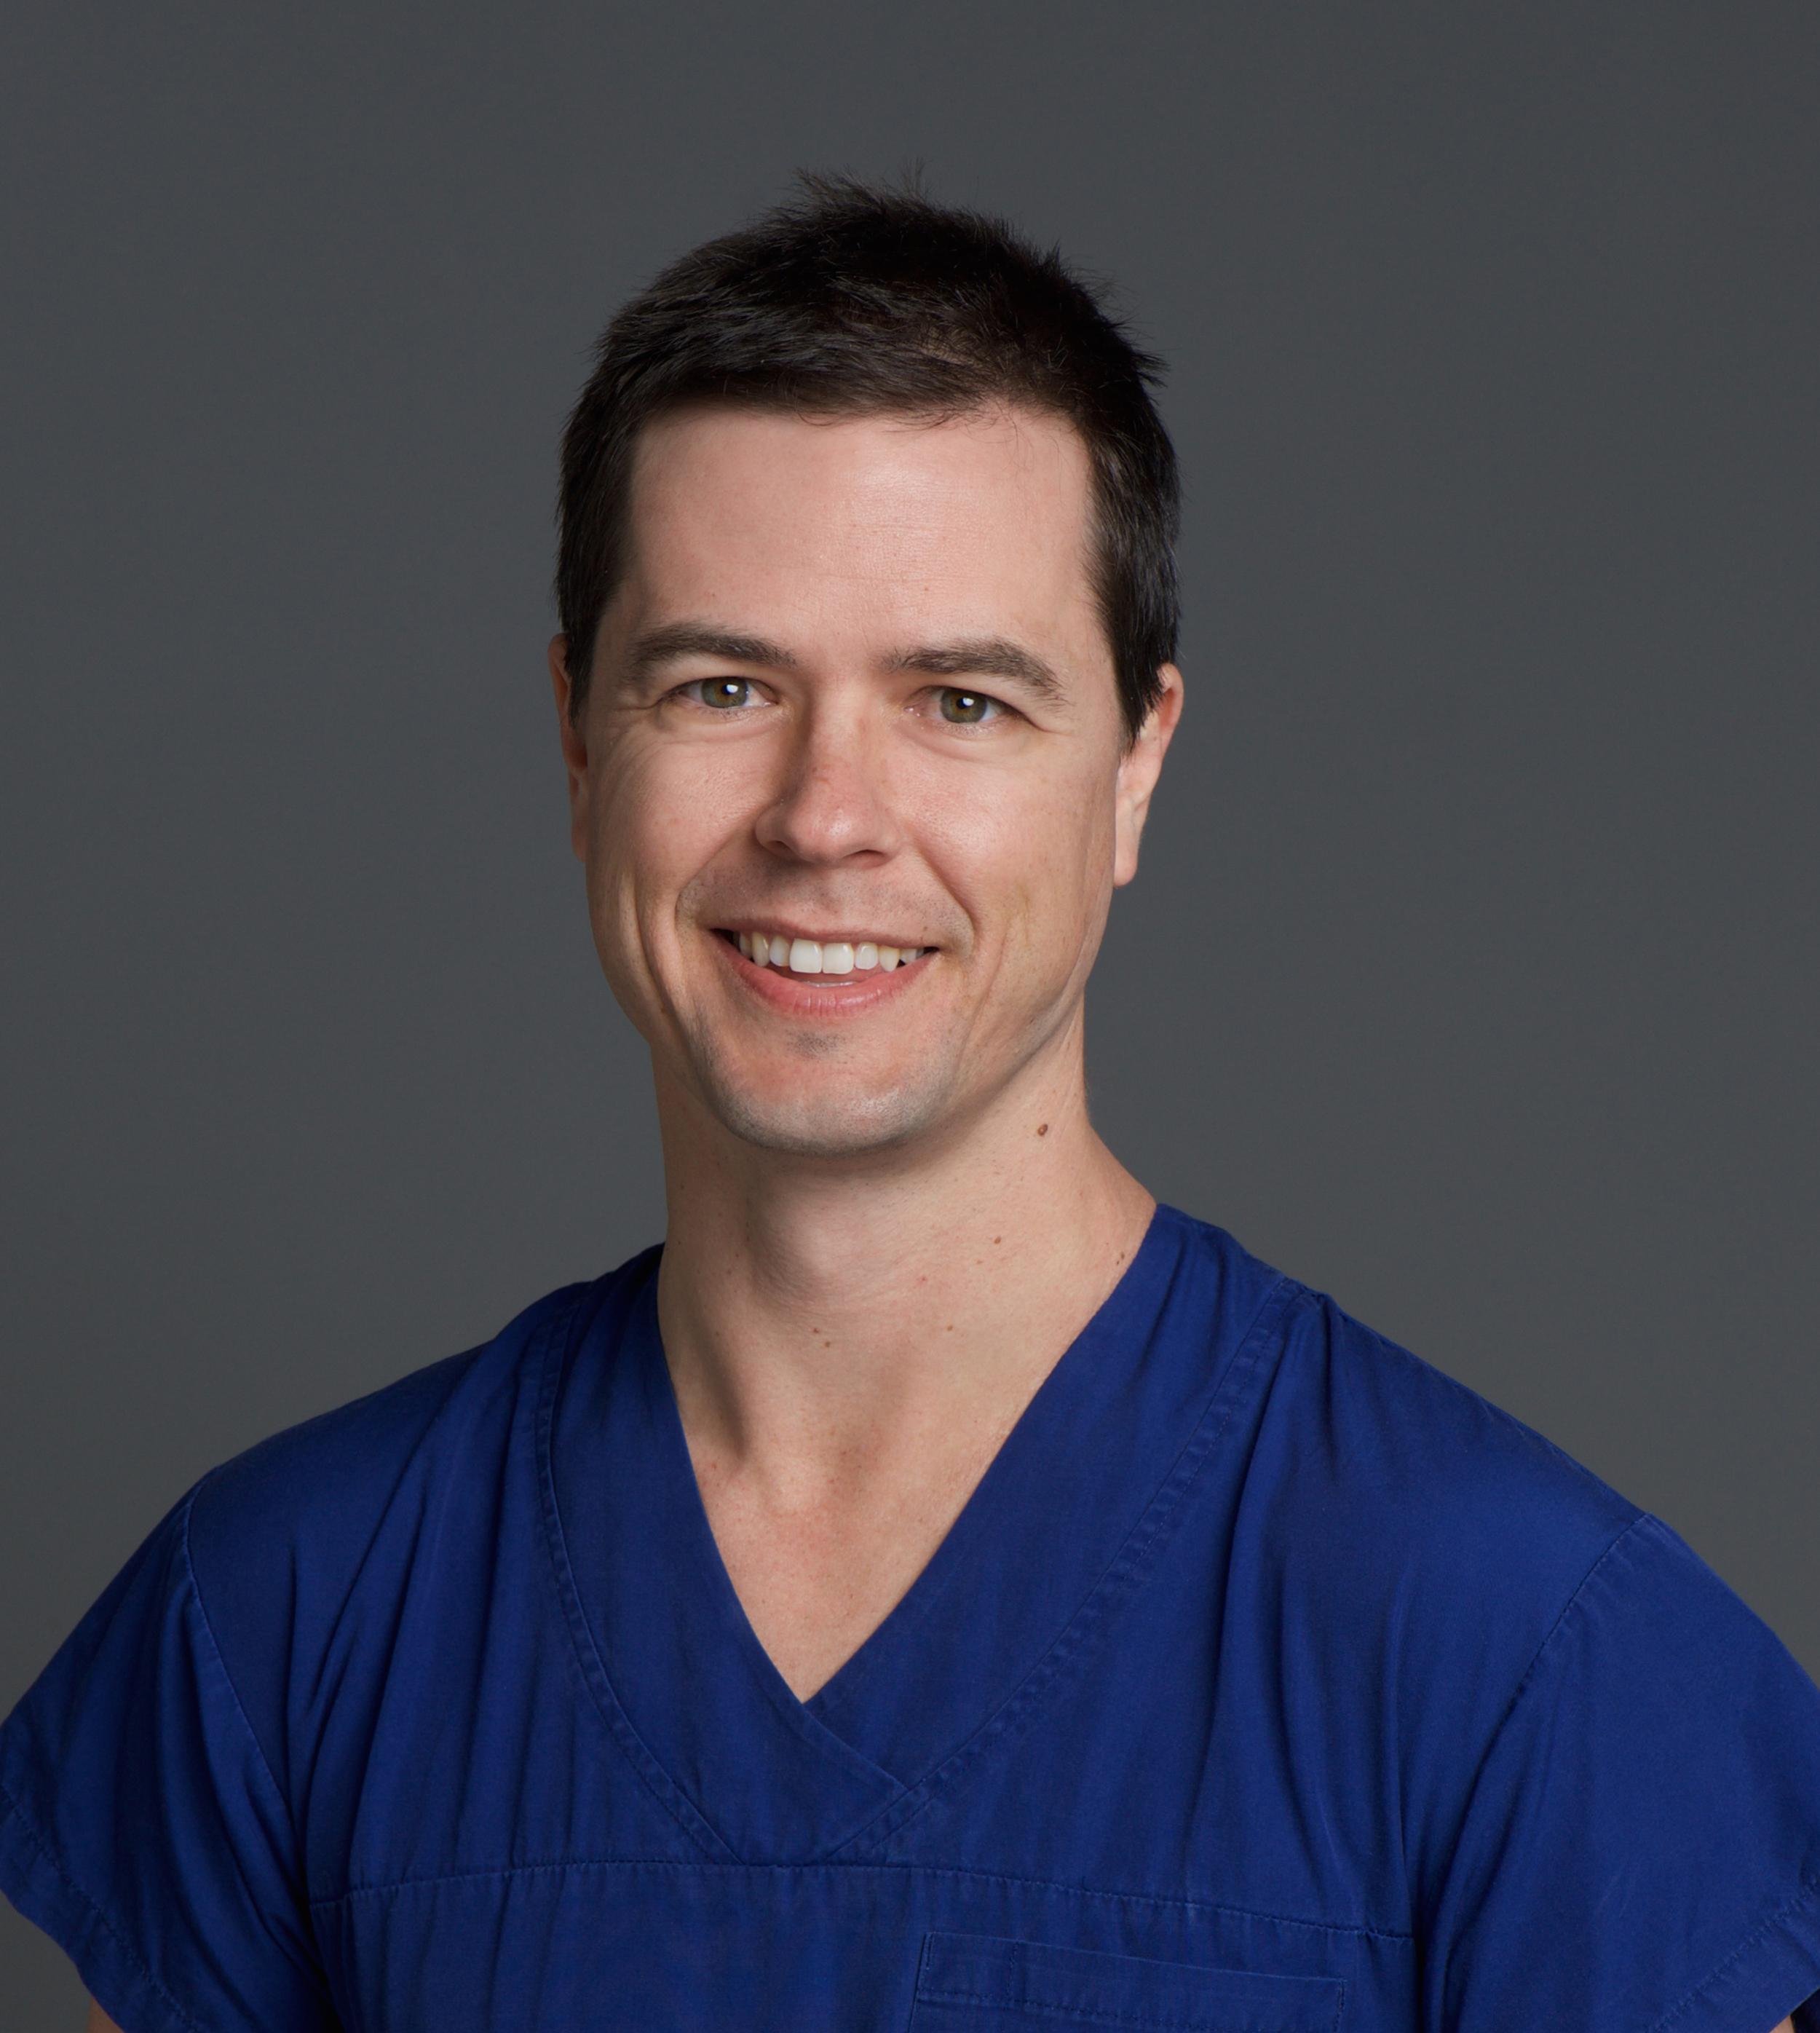 DR SAM CUNNEEN